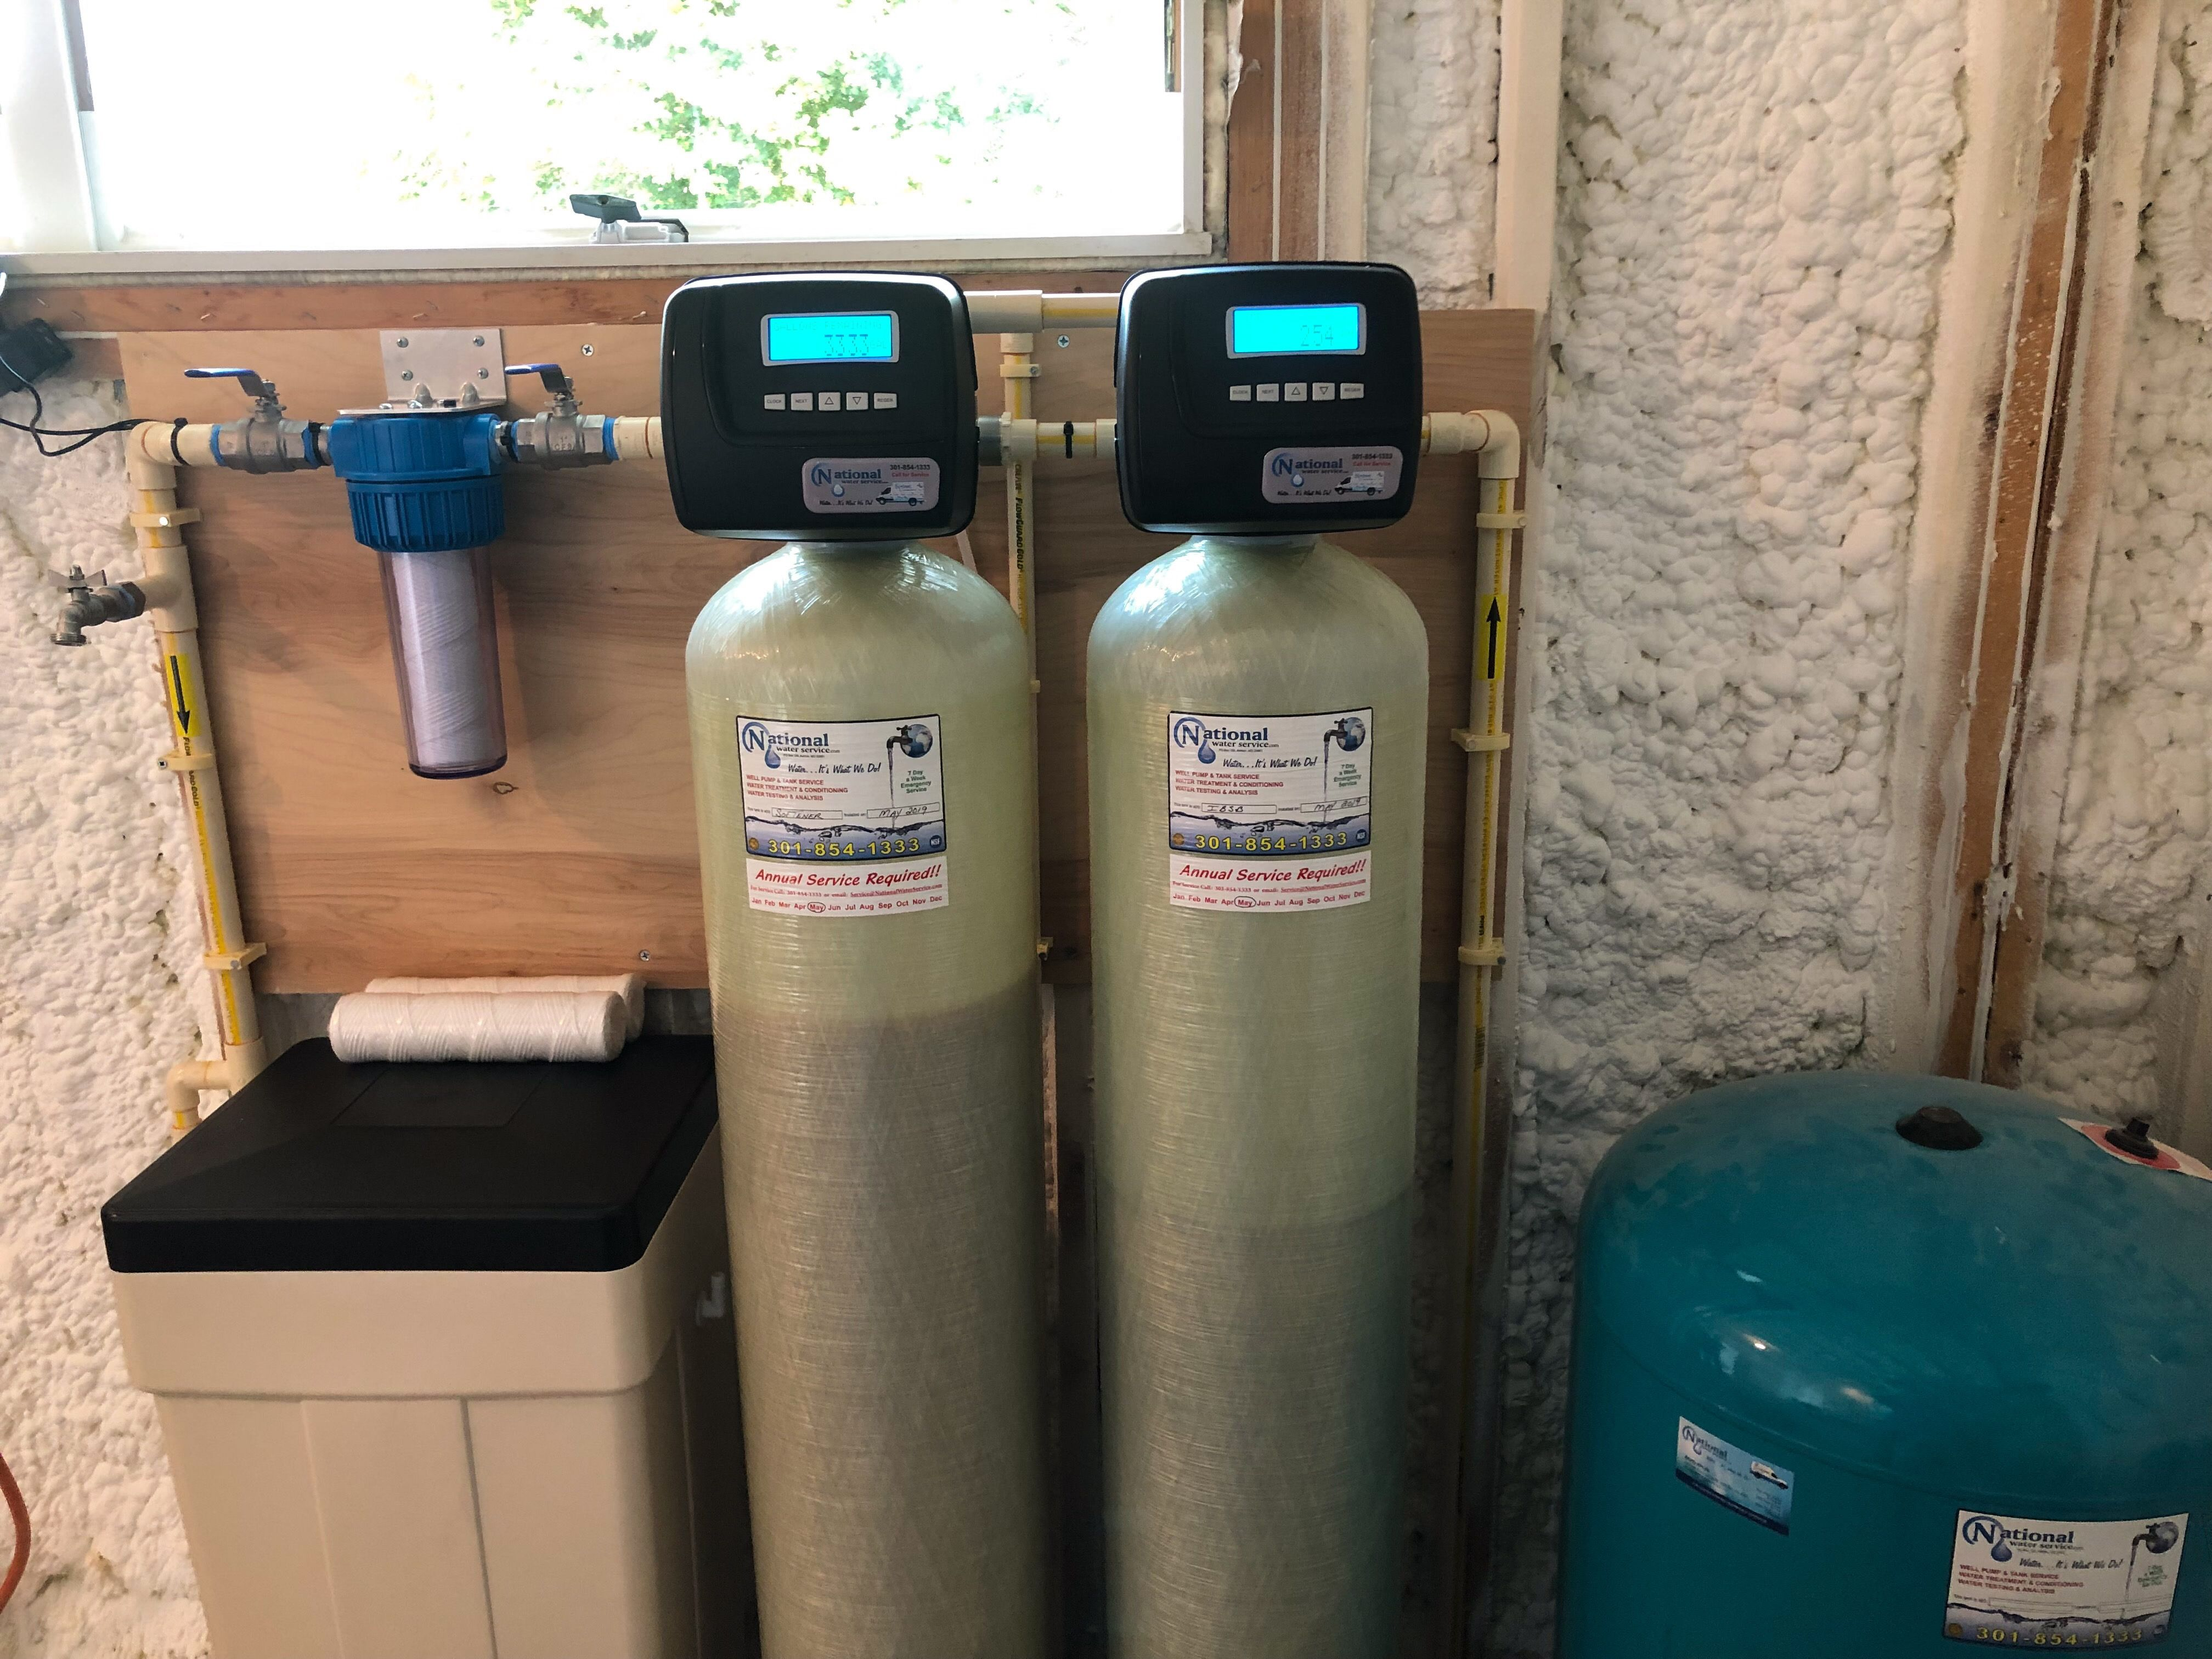 Water Softener Ibsb Sediment Filter Pressure Tank Water Treatment Water Softener Pressure Tanks